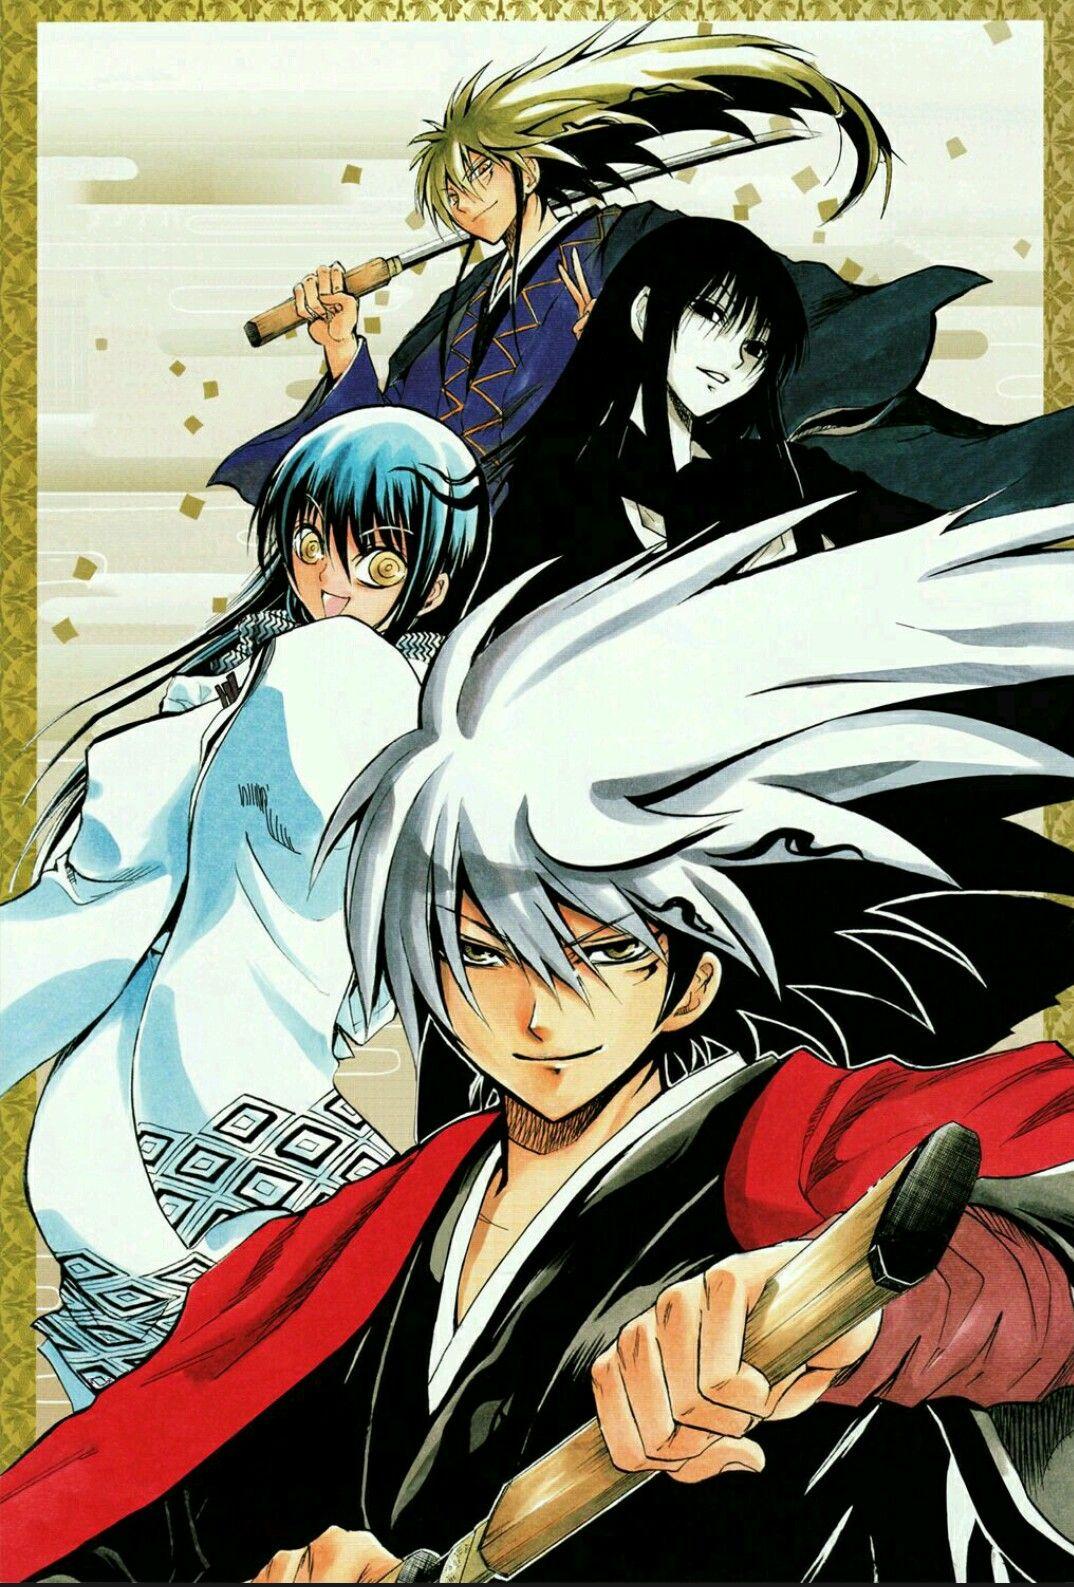 Pin by Abby Bourne on Nurarihyon no Mago Manga, Anime